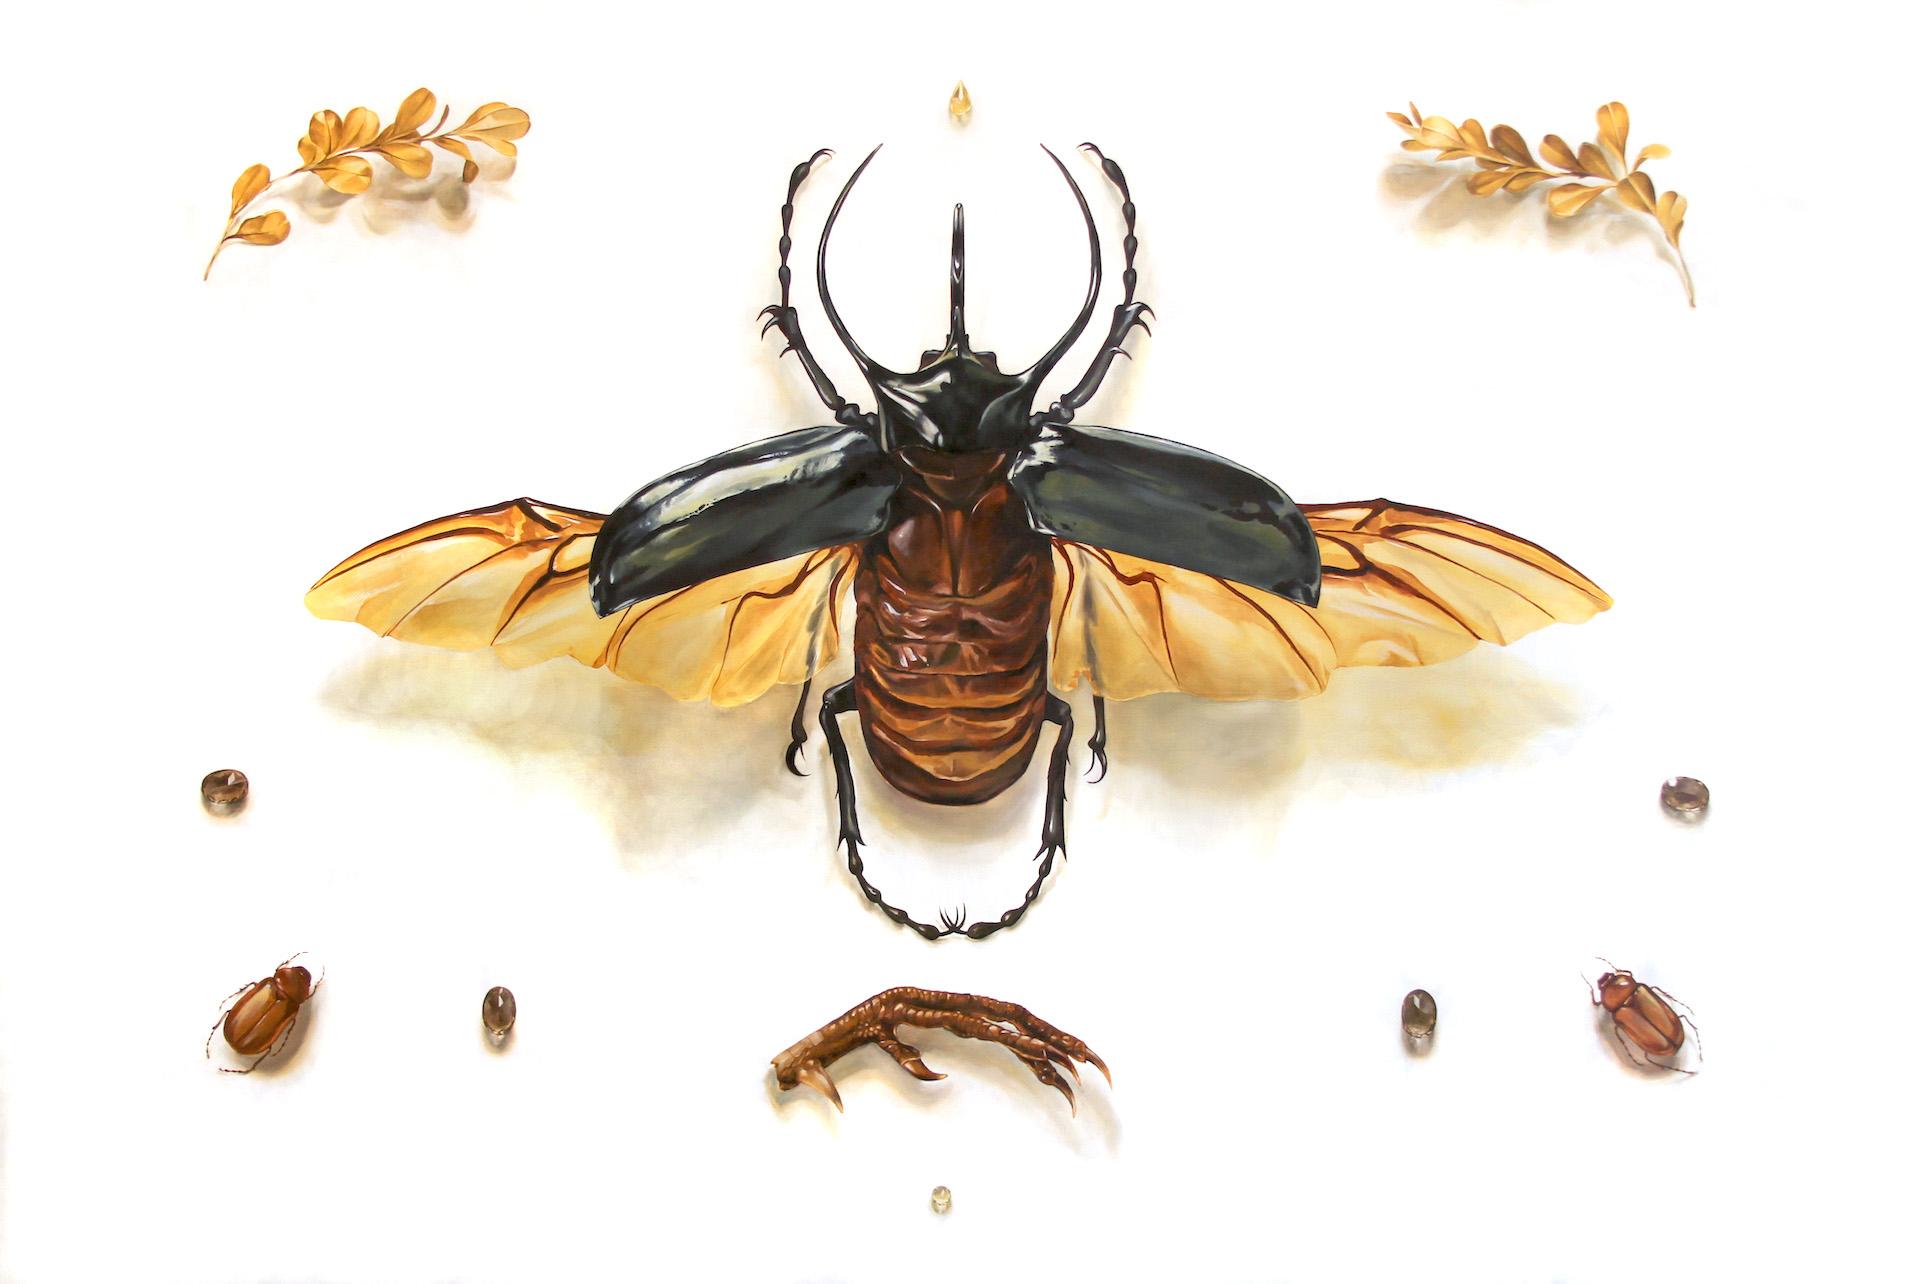 Veneration / Rhinoceros Beetle